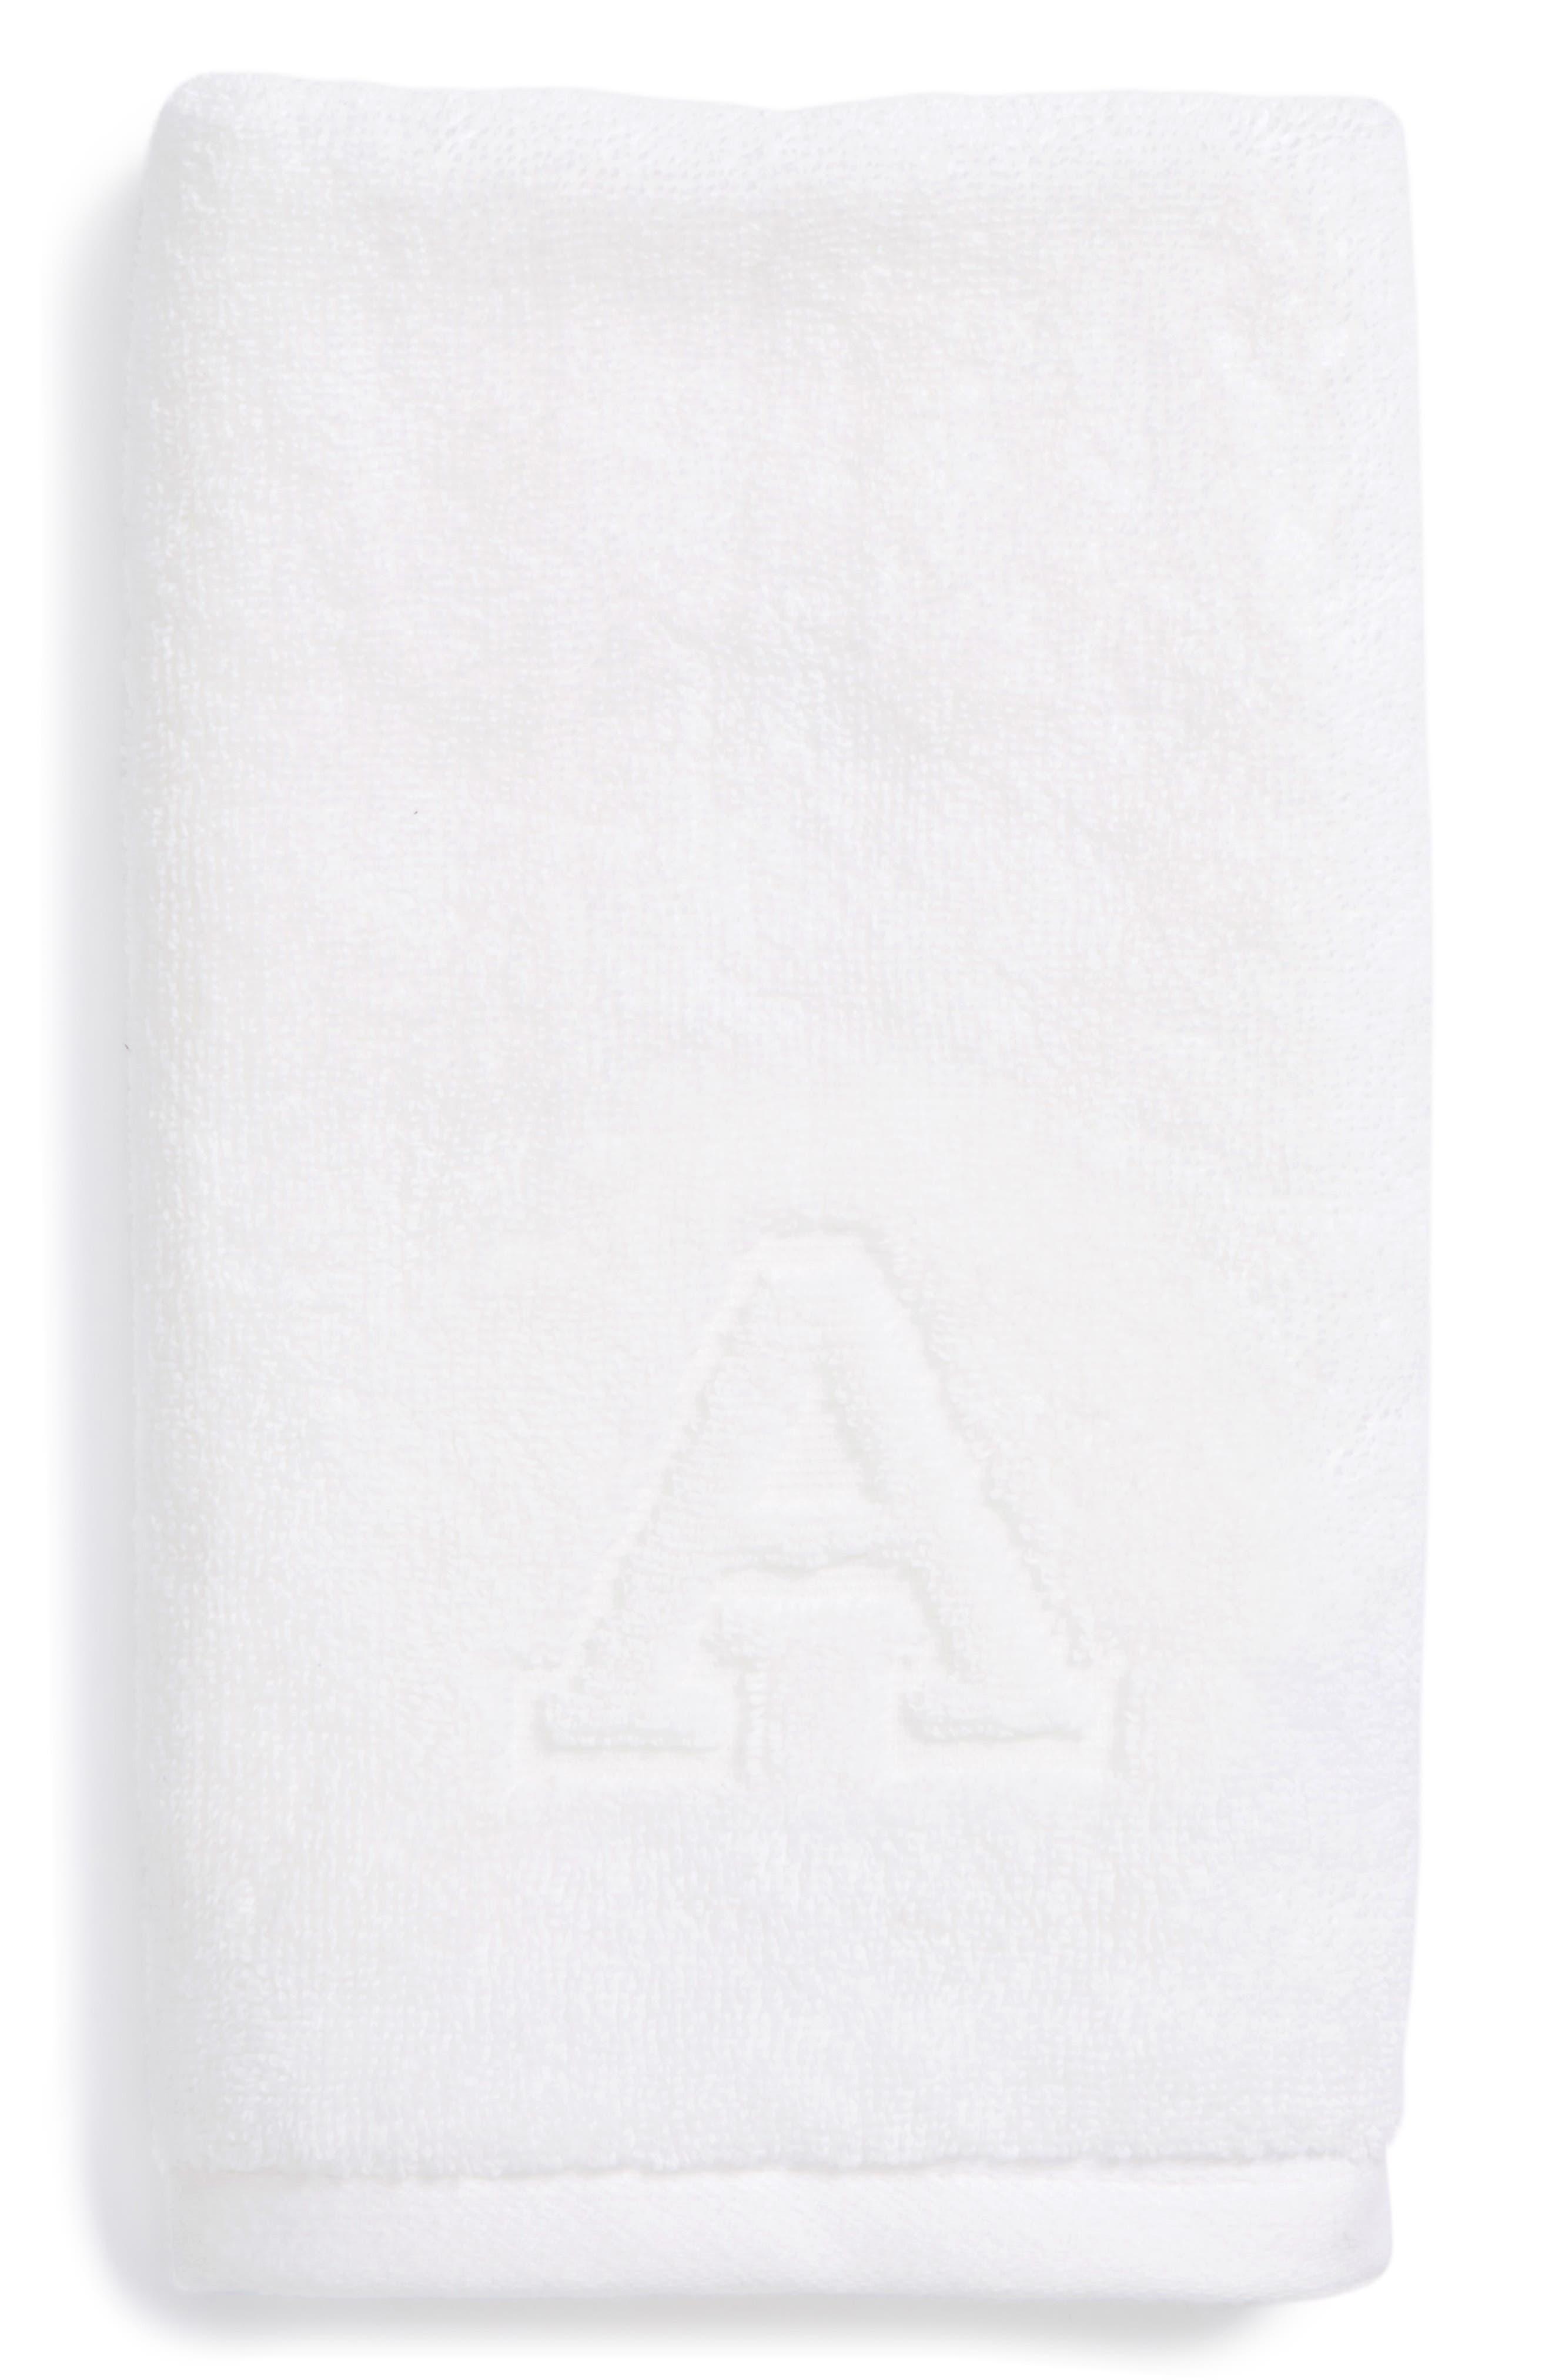 Auberge Fingertip Towel,                         Main,                         color, 100